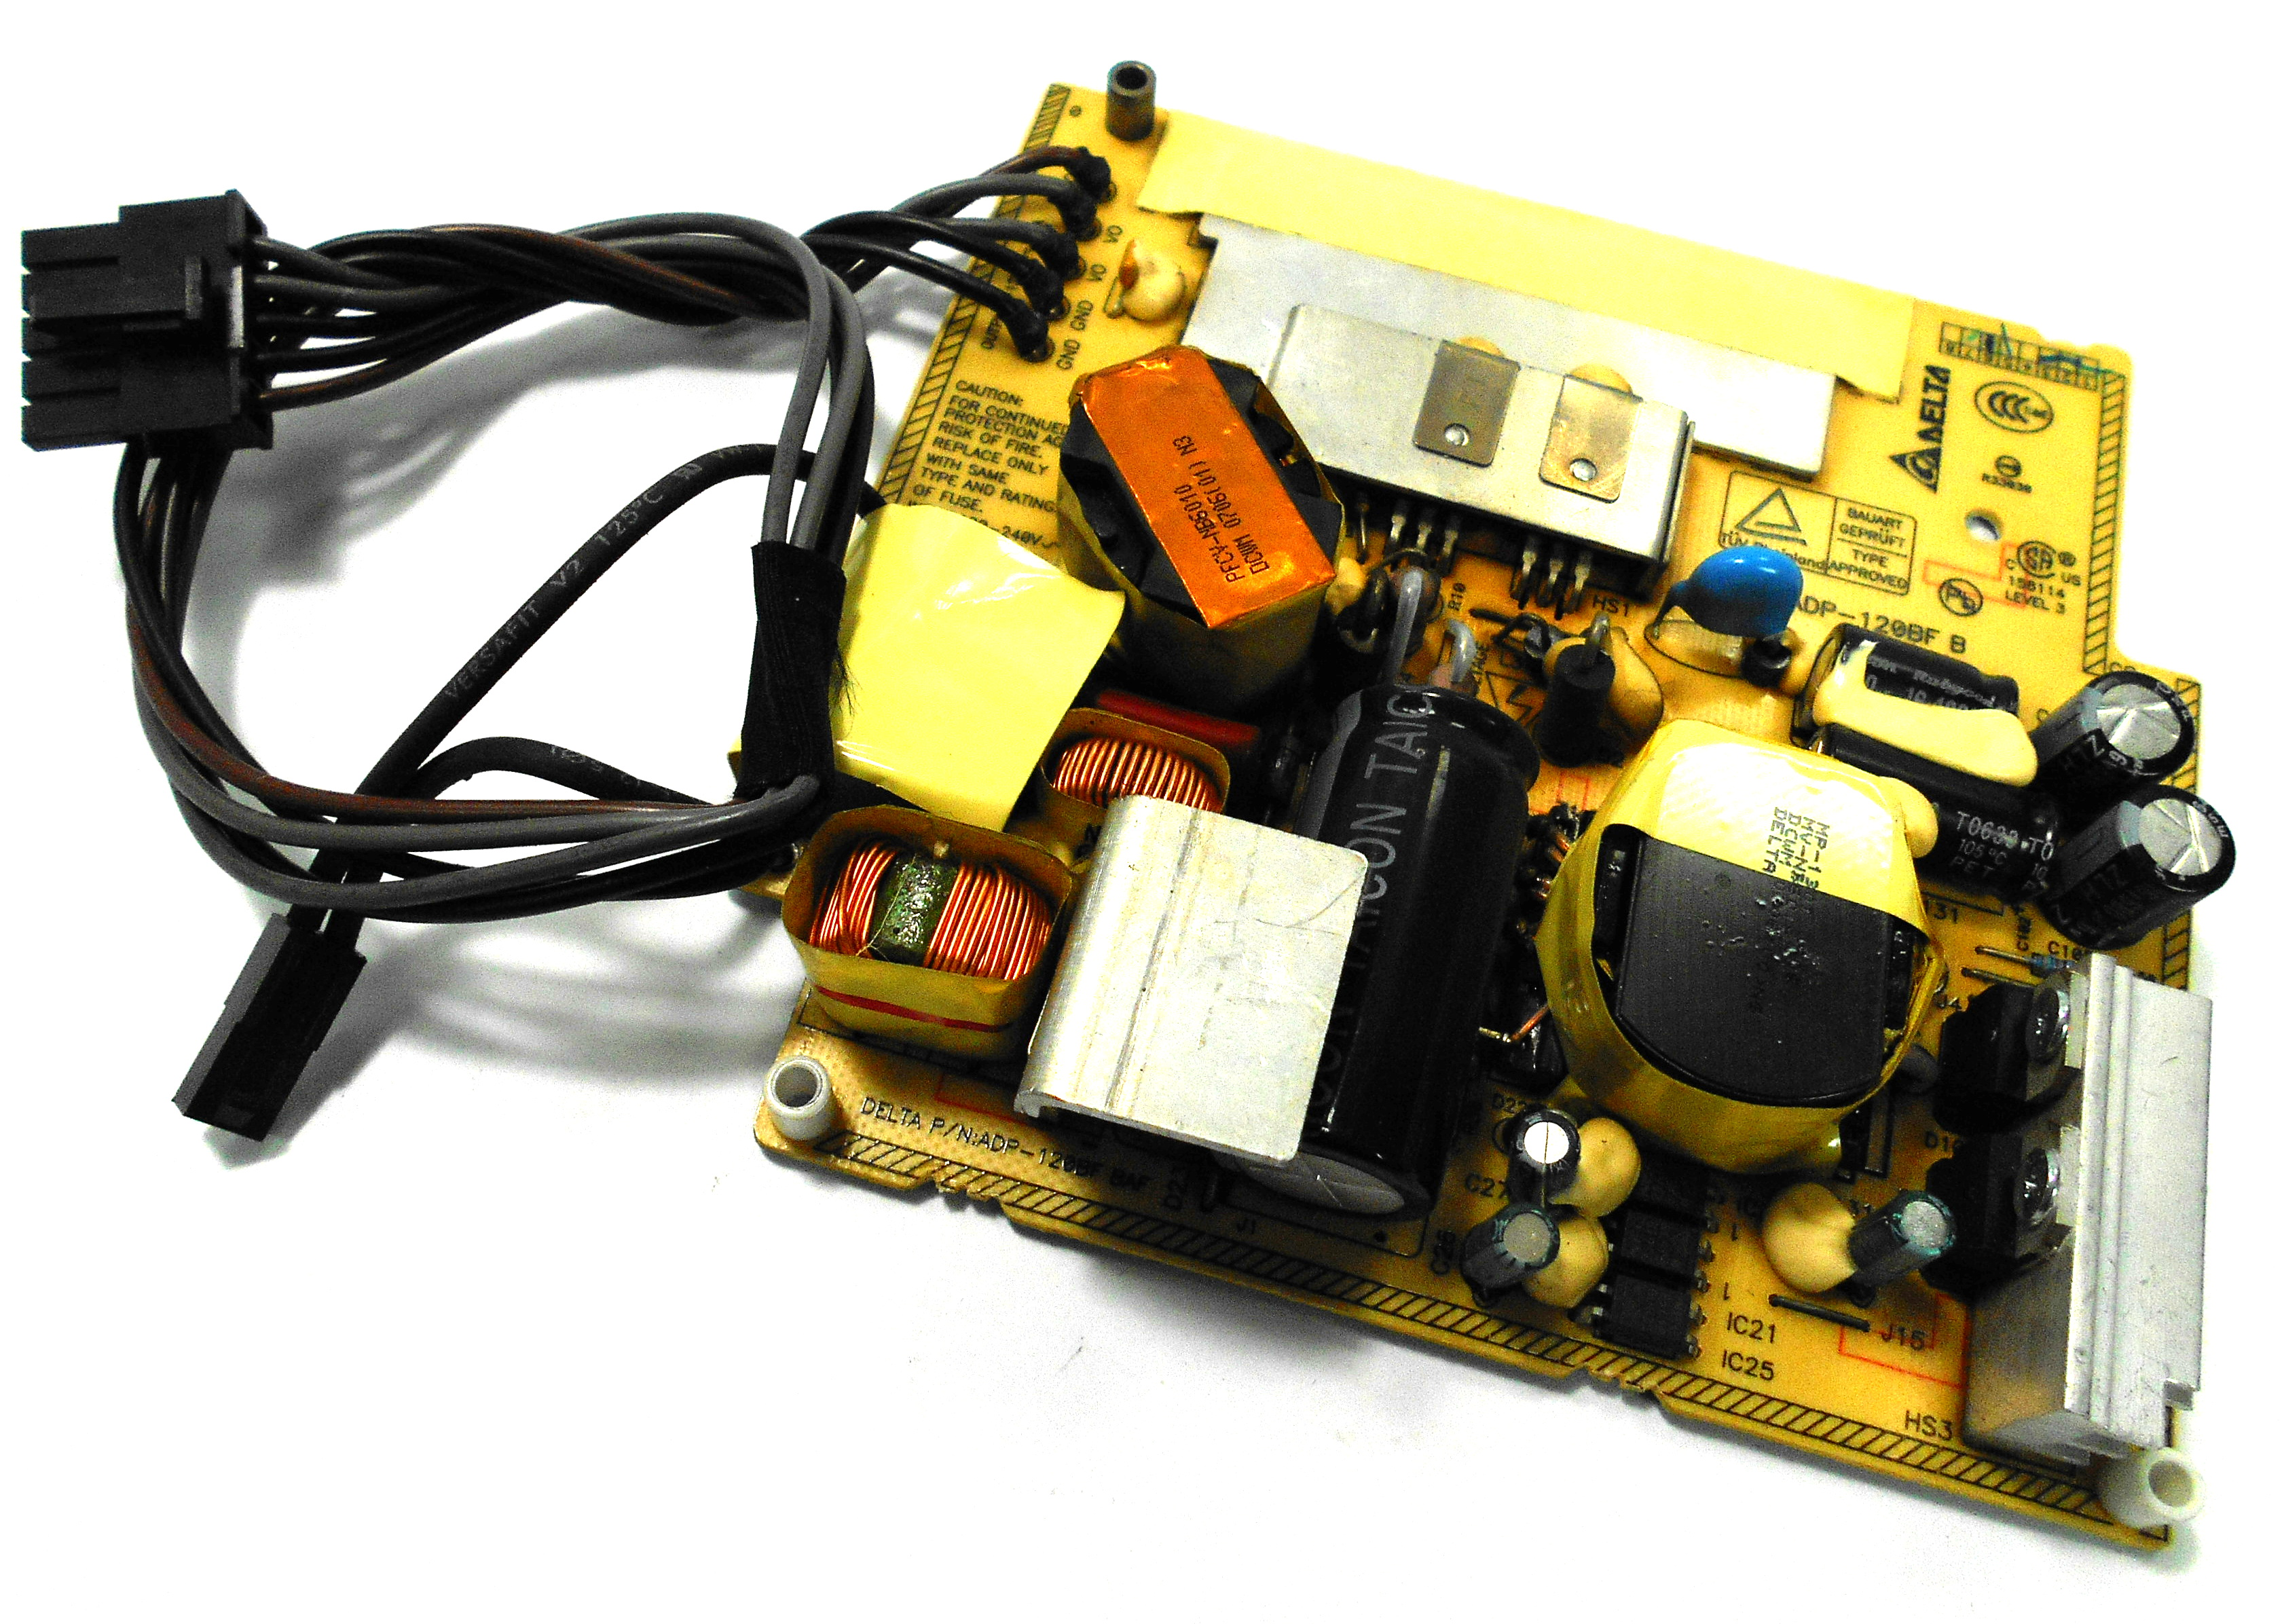 "614-0381 Apple 120W PSU f/ iMac 17"" A1195 (EMC 2124)  - DELTA ADP-120BF B"